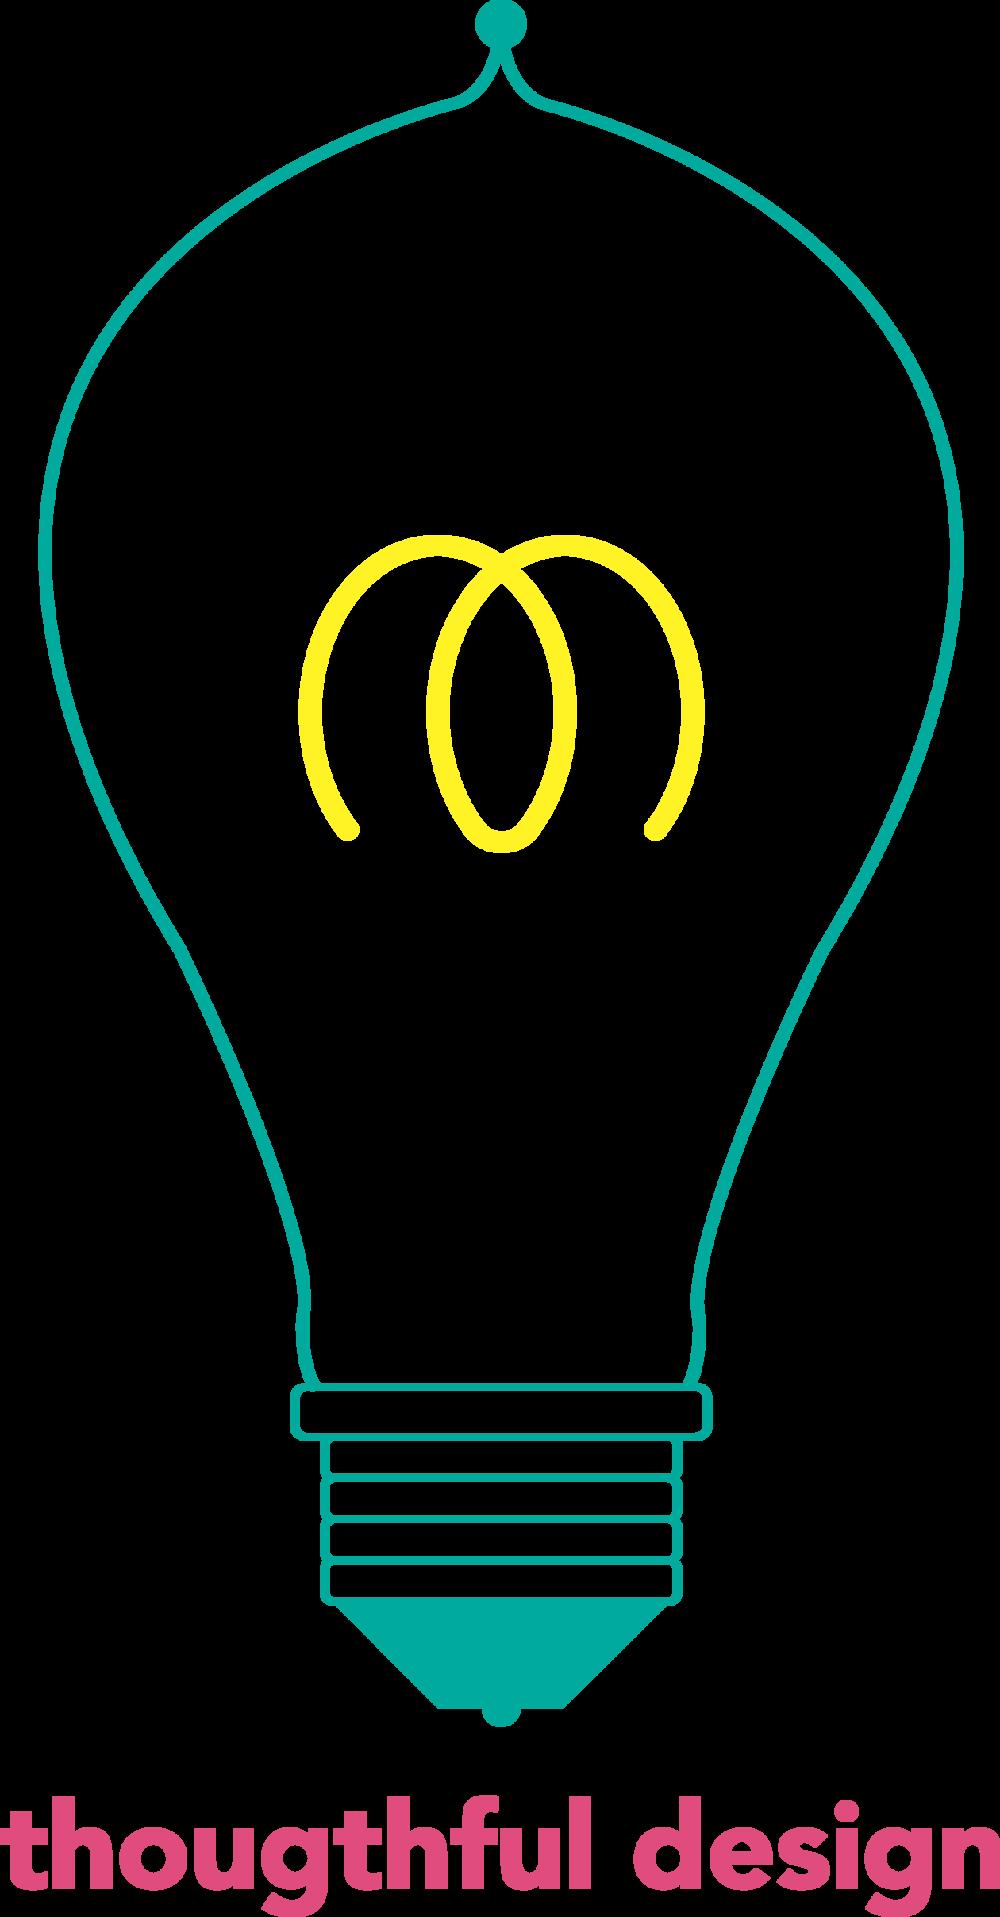 Thoughtful design 1